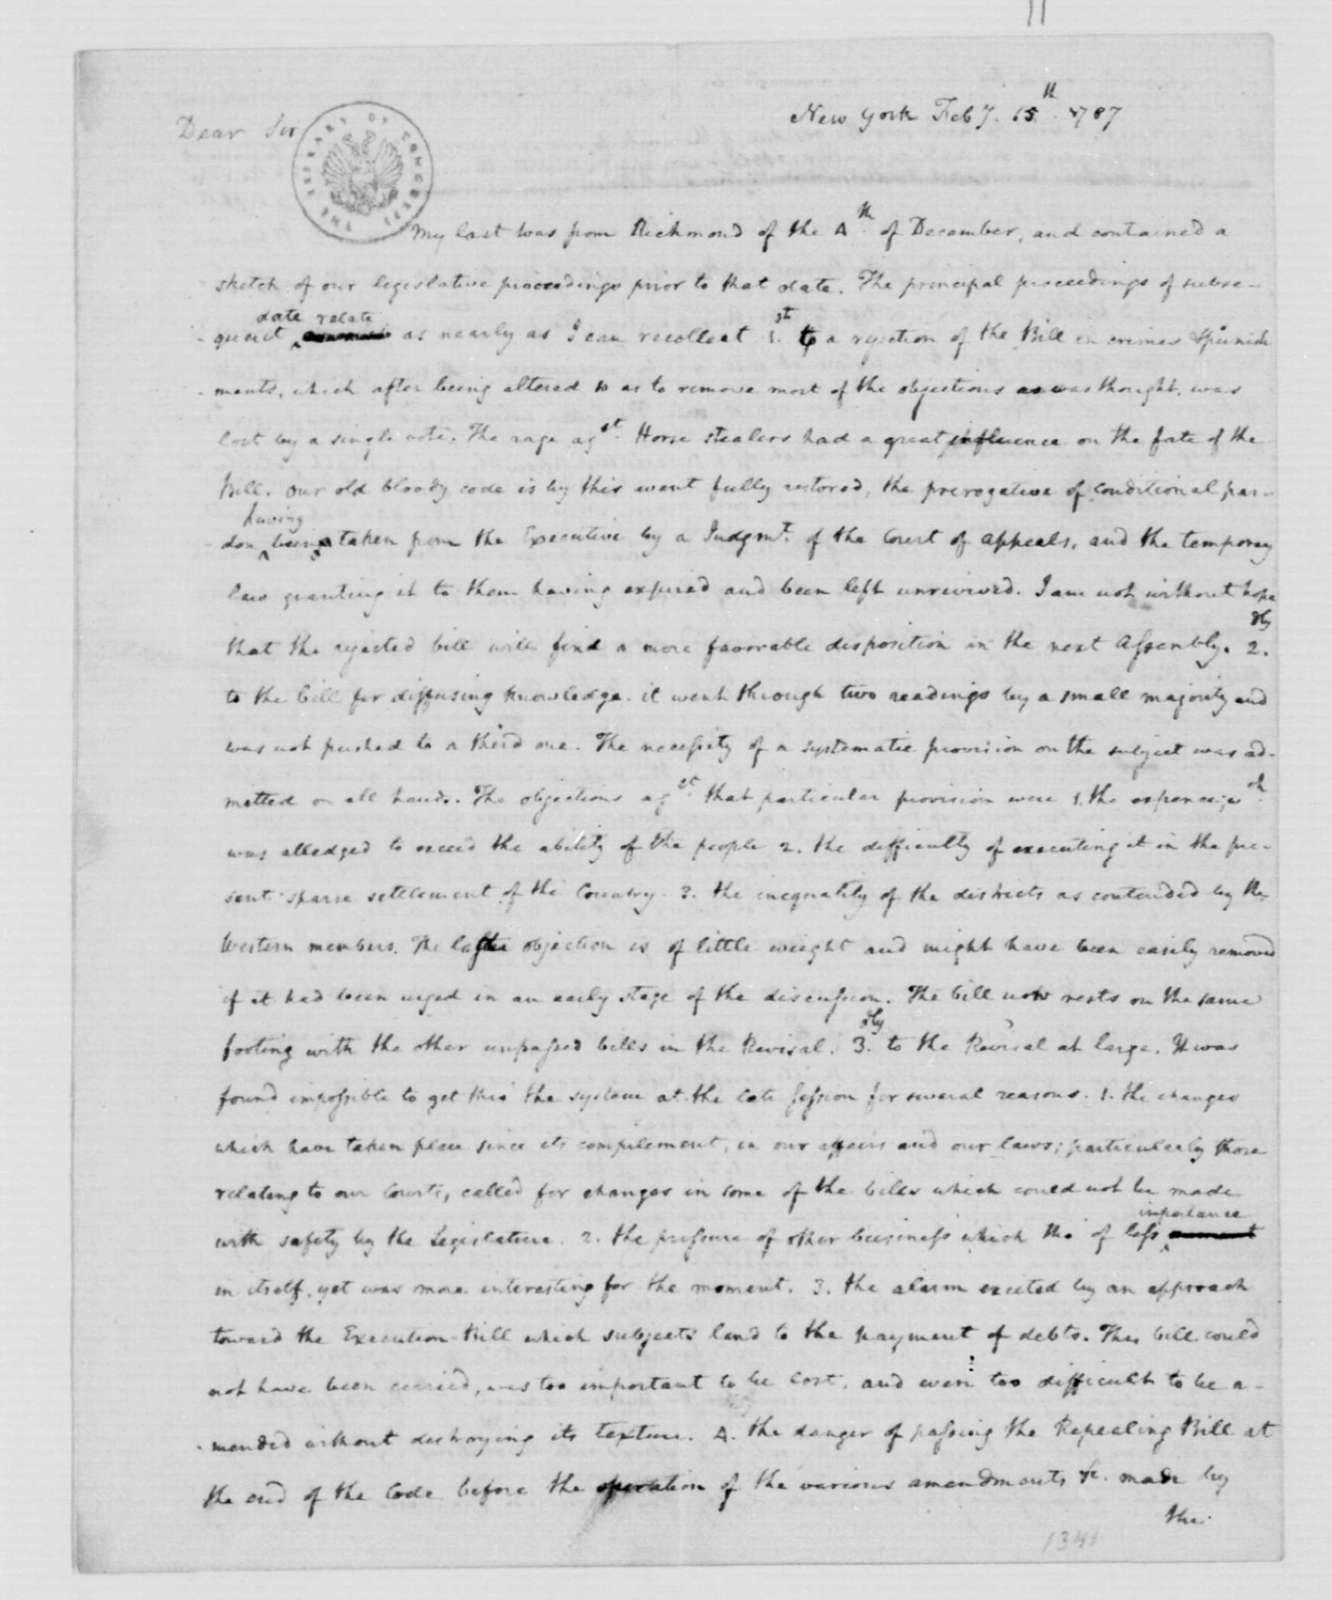 James Madison to Thomas Jefferson, February 15, 1787.